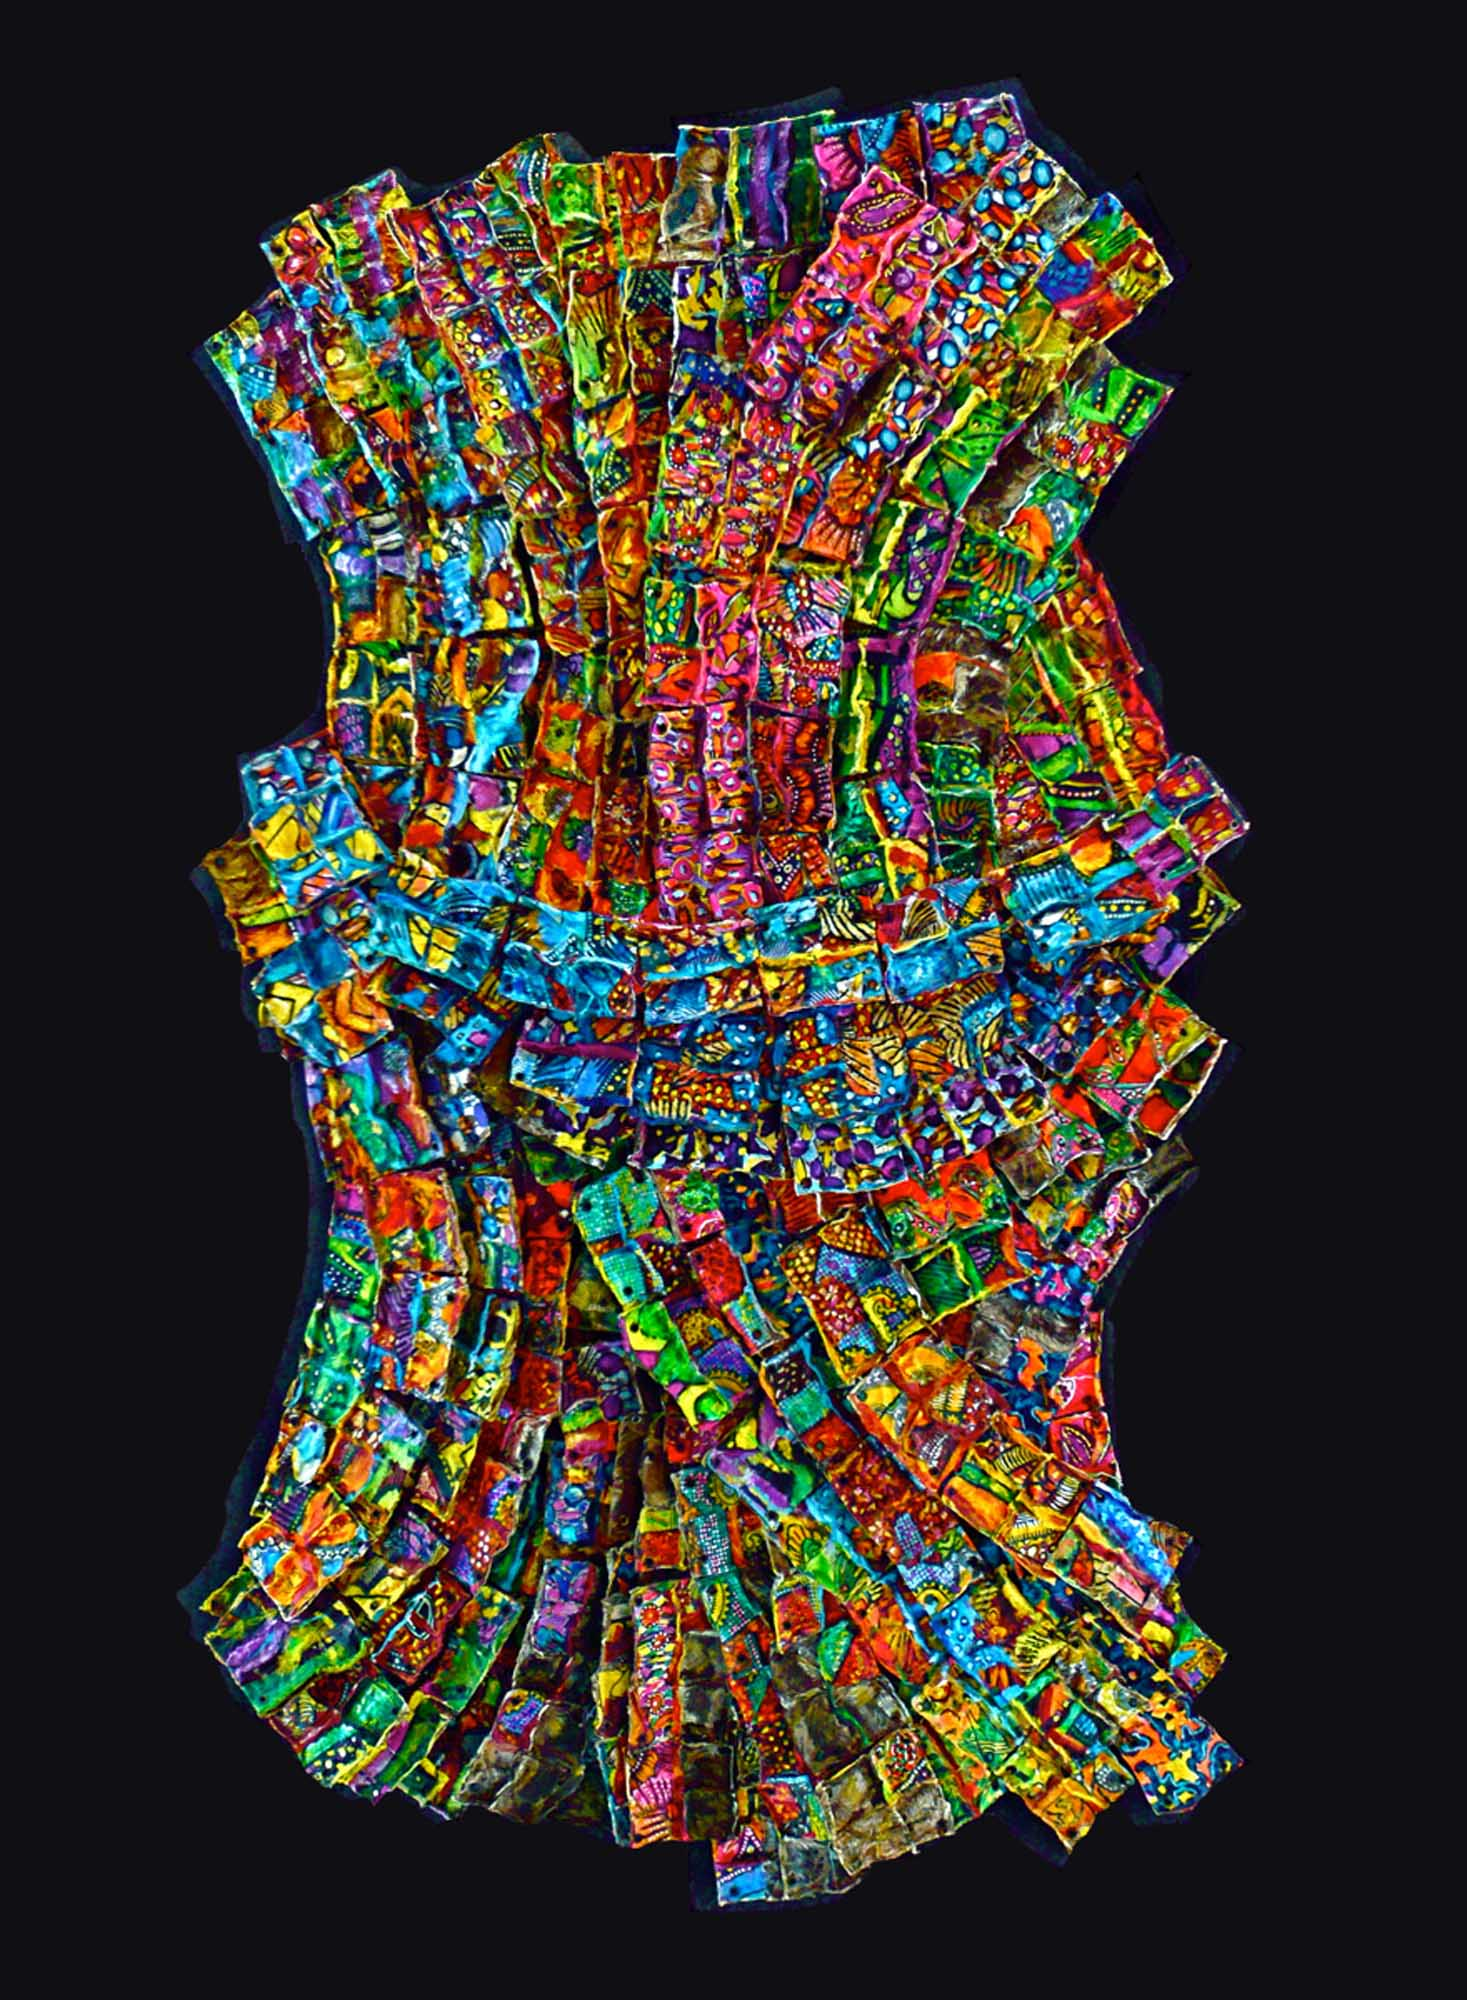 bouclier-2 127x74x8cm